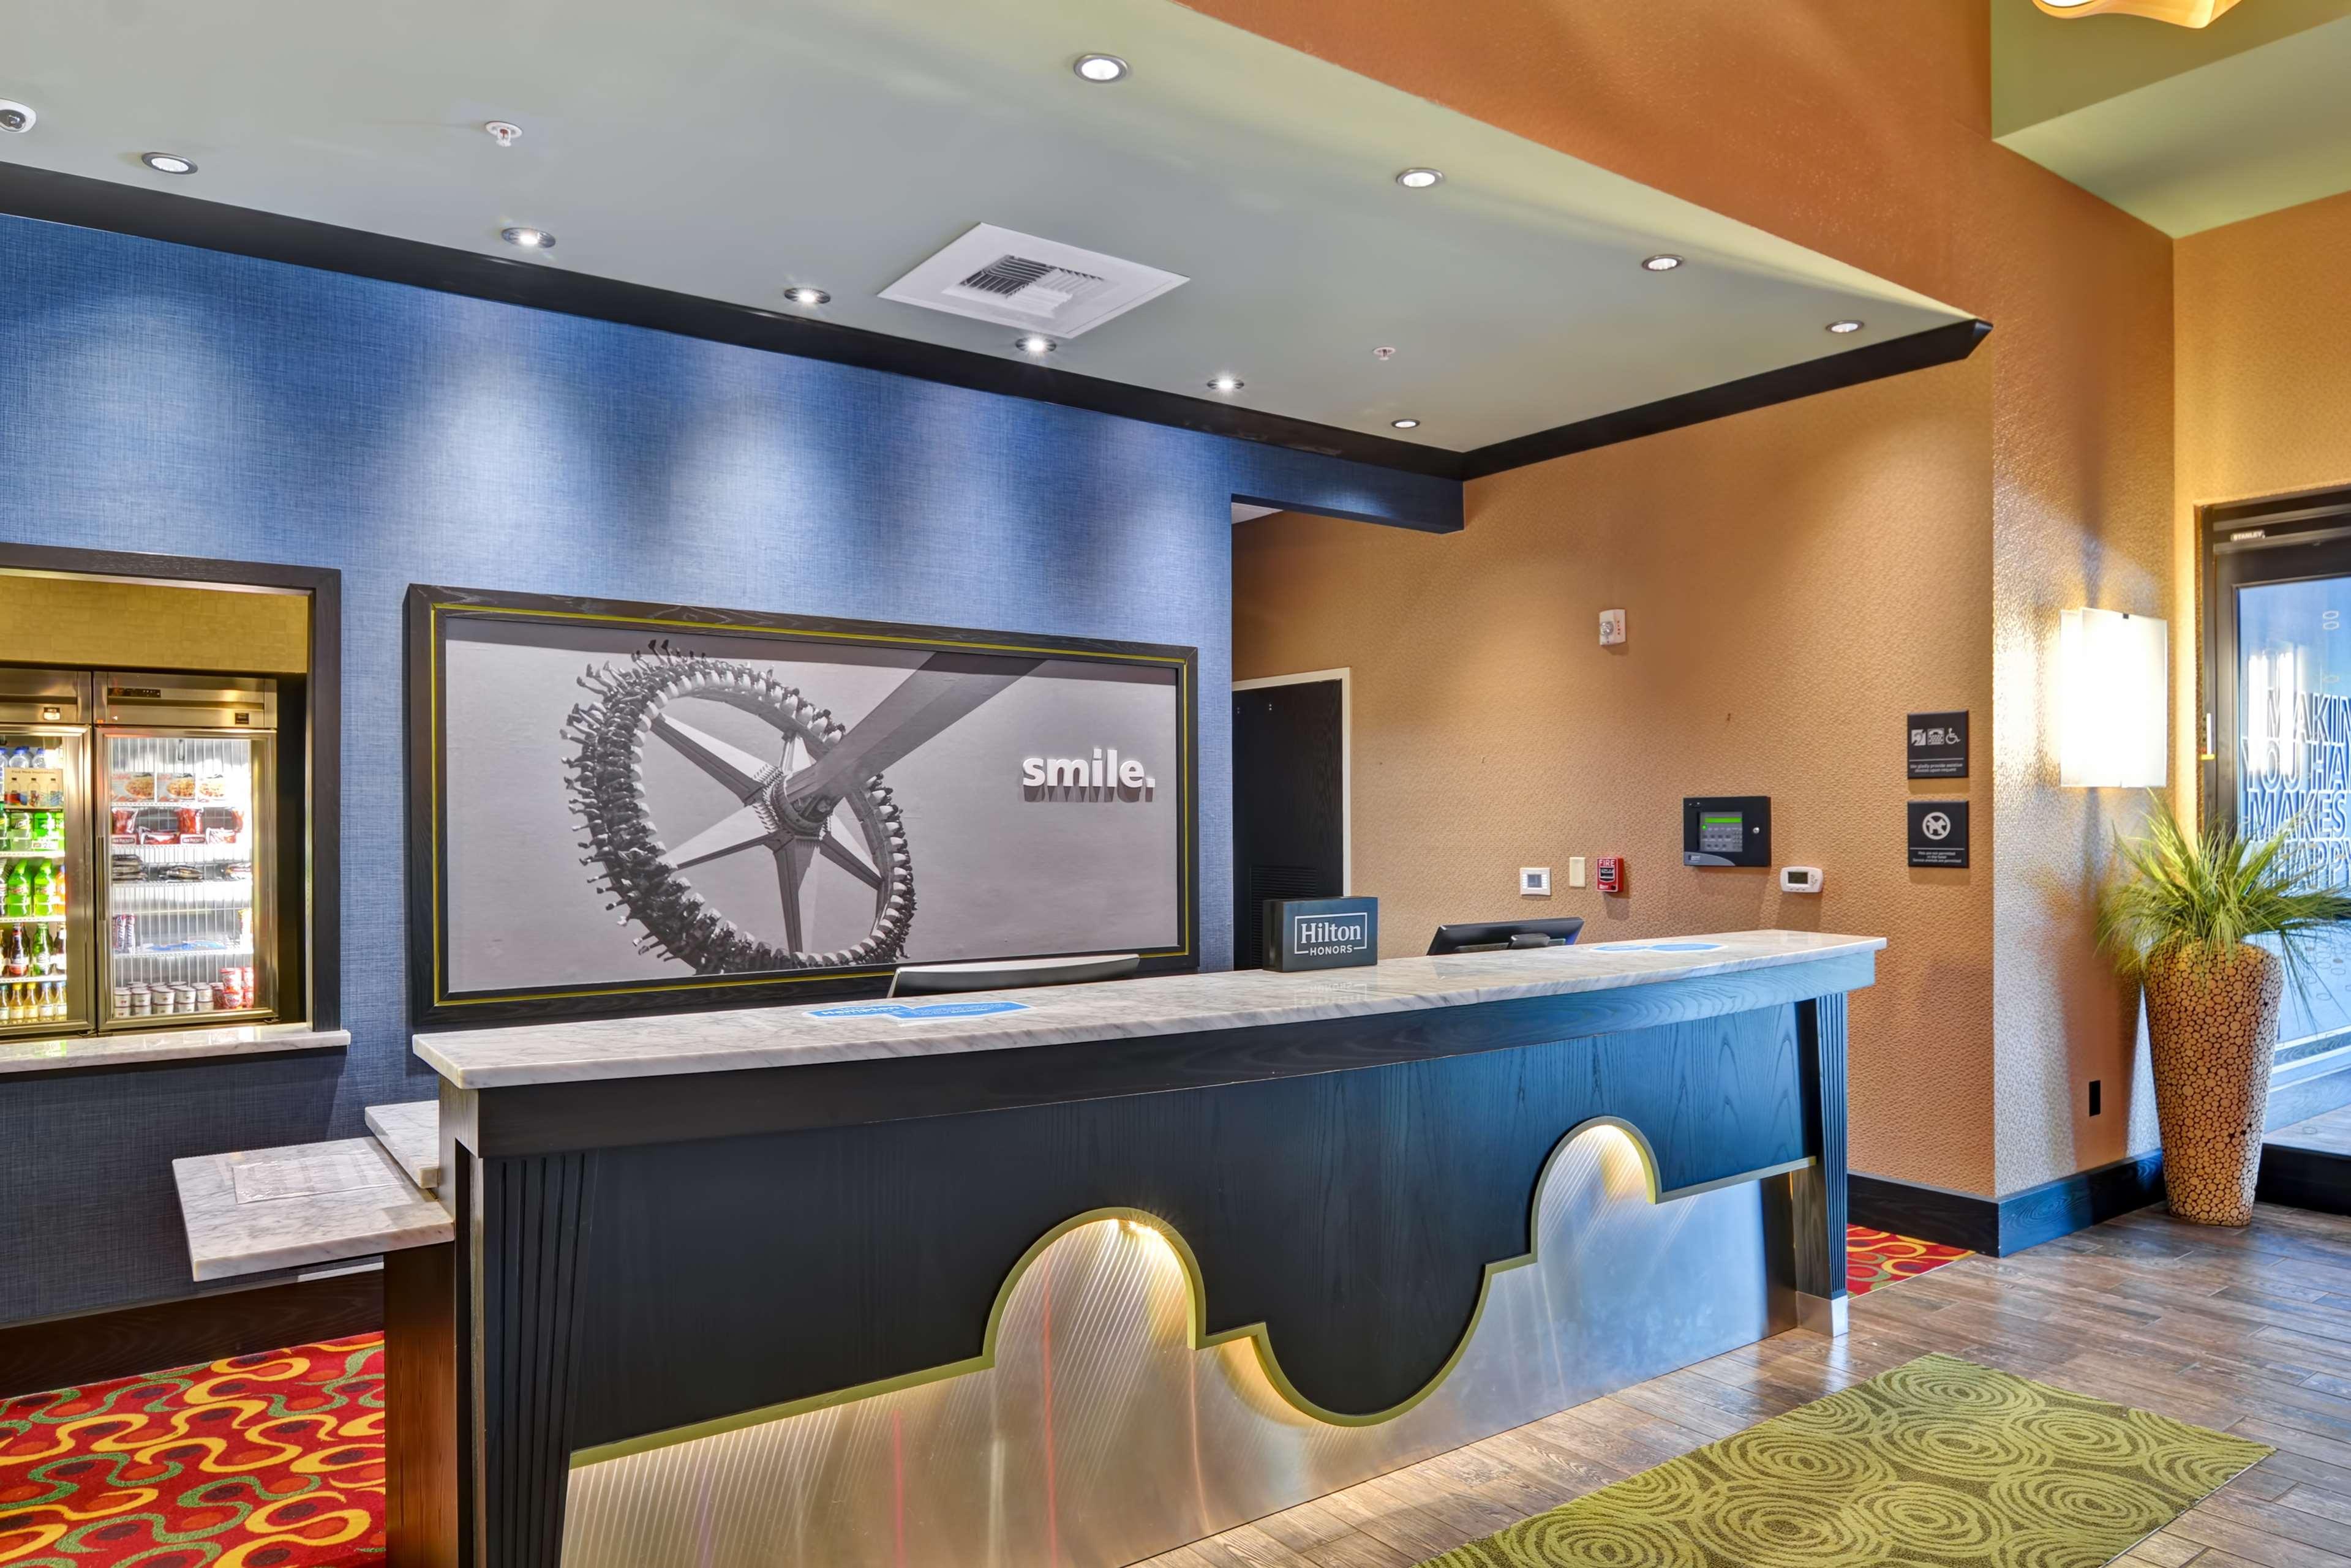 Hampton Inn & Suites Raleigh/Crabtree Valley image 8